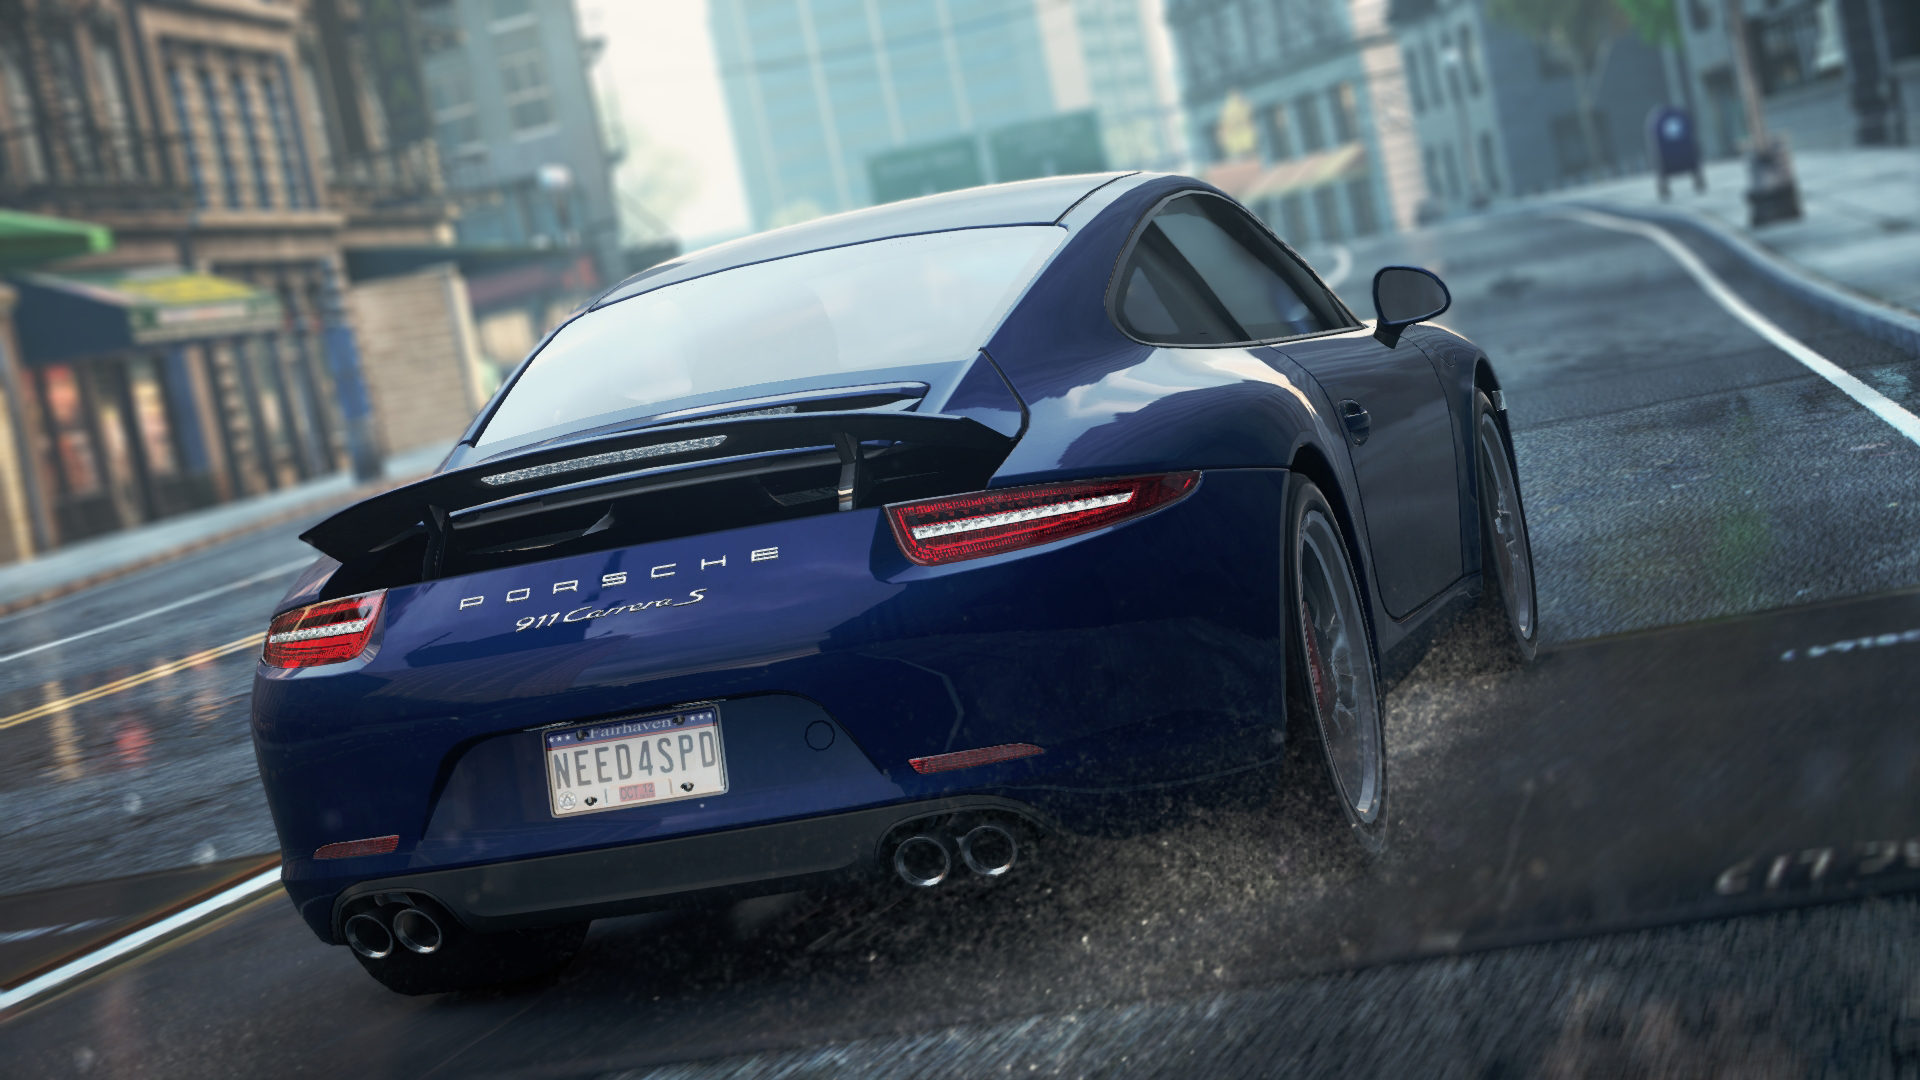 Porsche 911 carrera s 991 need for speed wiki fandom - Porsche 911 carrera s wallpaper ...